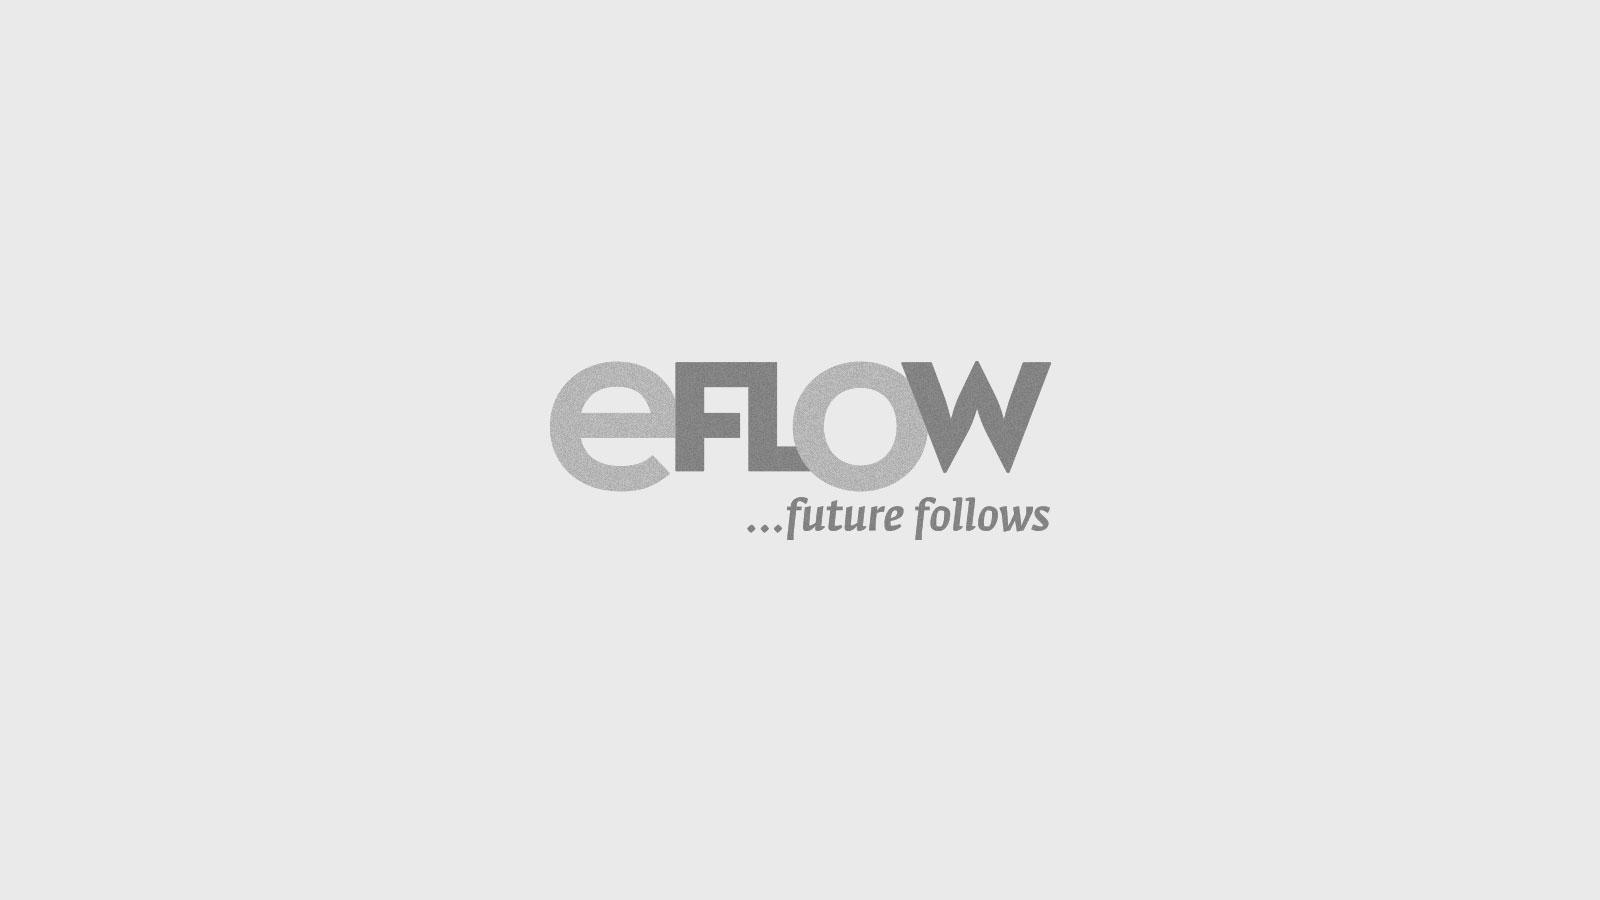 eflow-1600x900-4